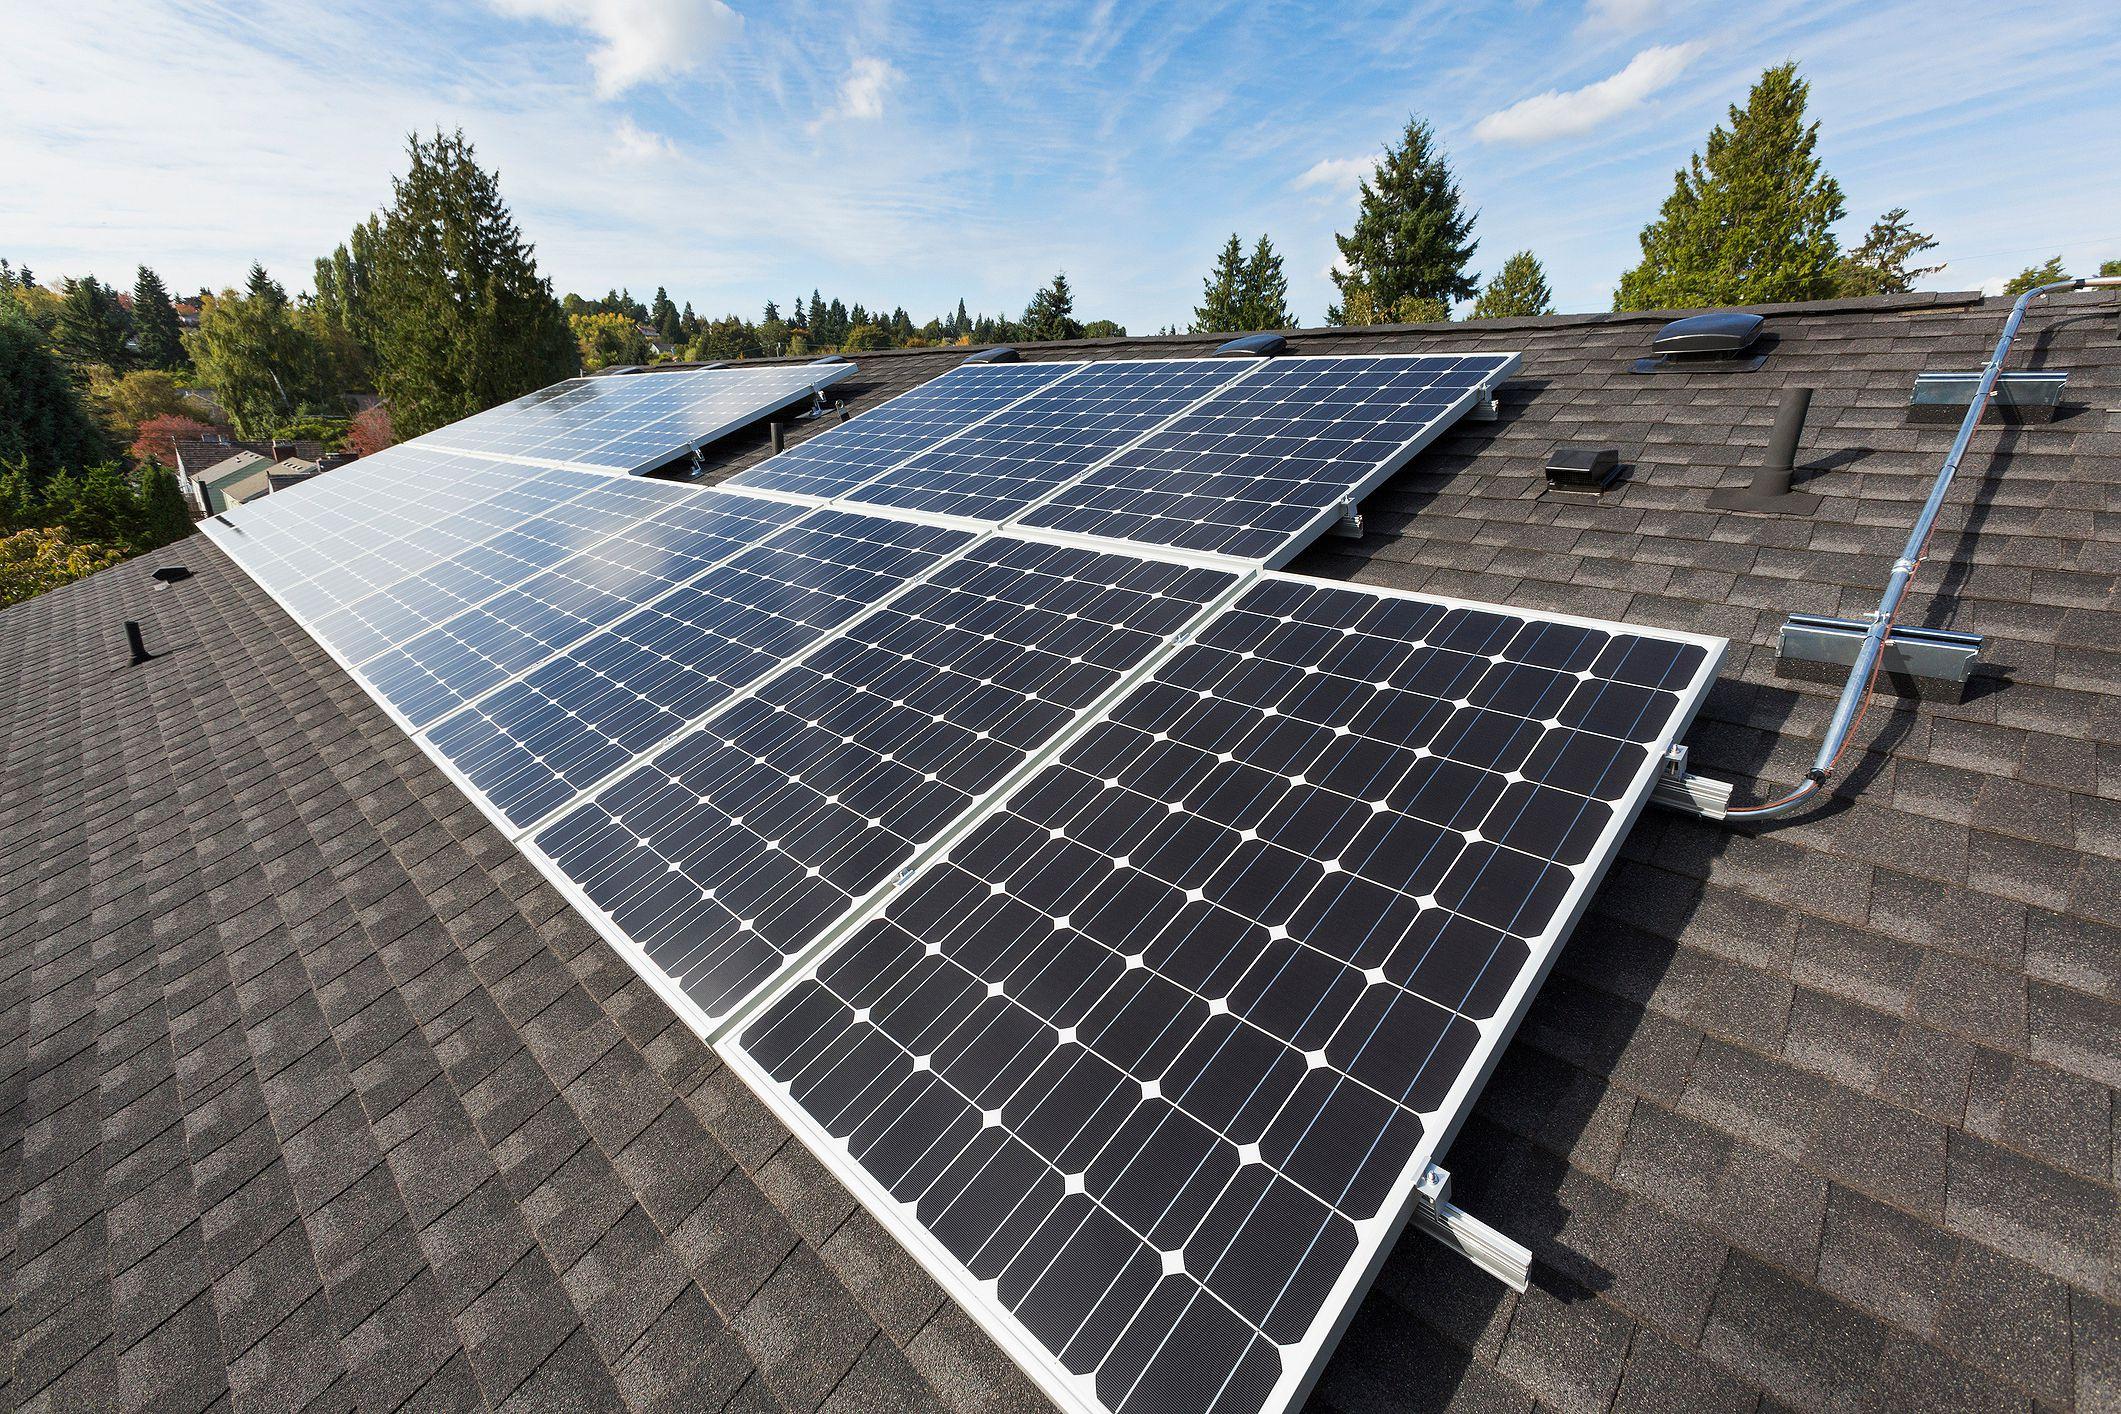 Solar panels GettyImages 188066505 587574a23df78c17b6e071ca Top Result 50 Inspirational Portable solar Panels Image 2018 Hdj5